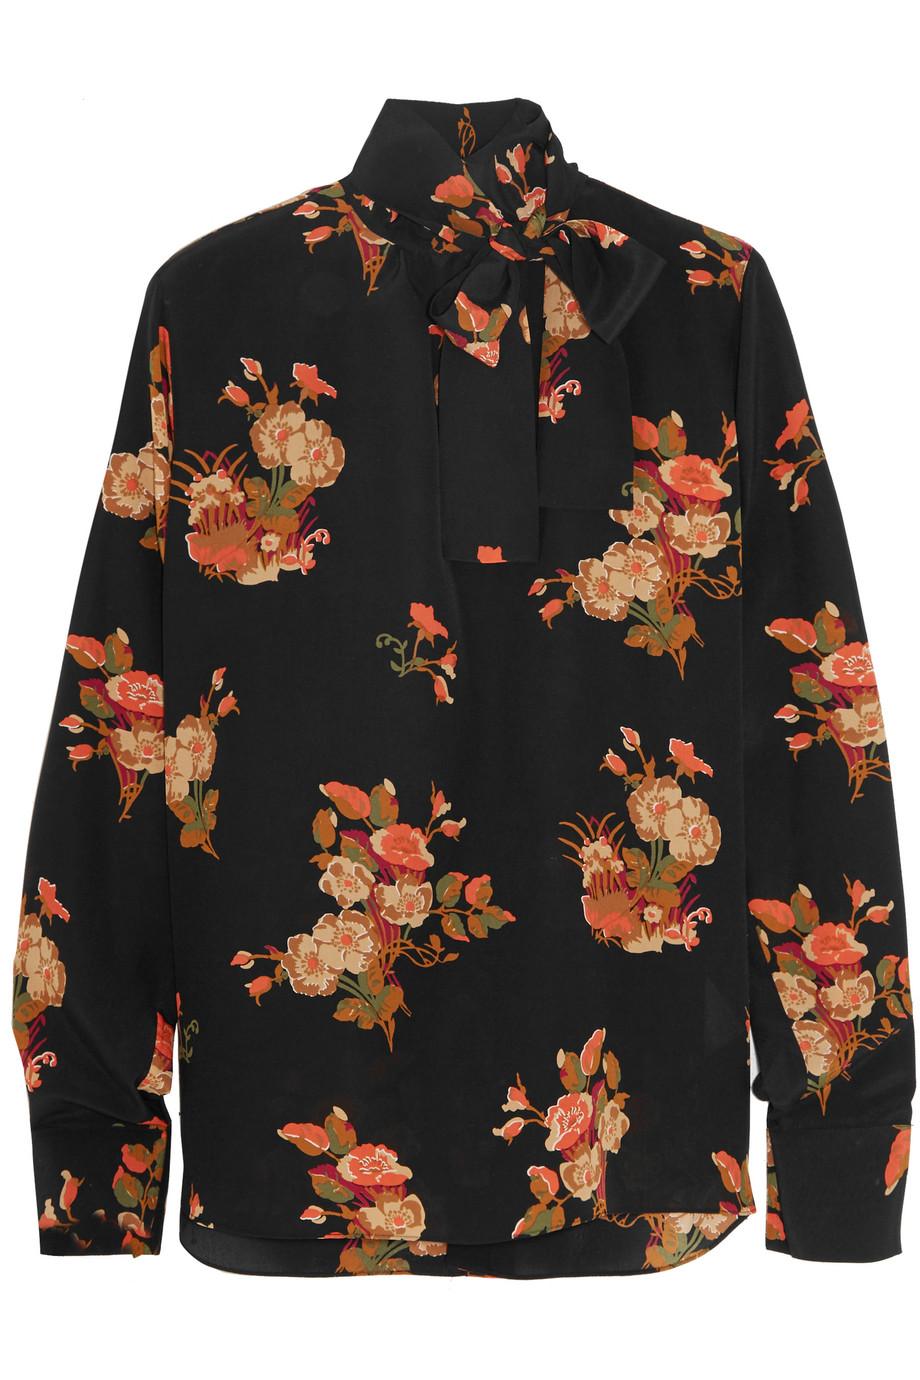 Valentino Pussy-Bow Floral-Print Silk Crepe De Chine Blouse, Black/Orange, Women's, Size: 40